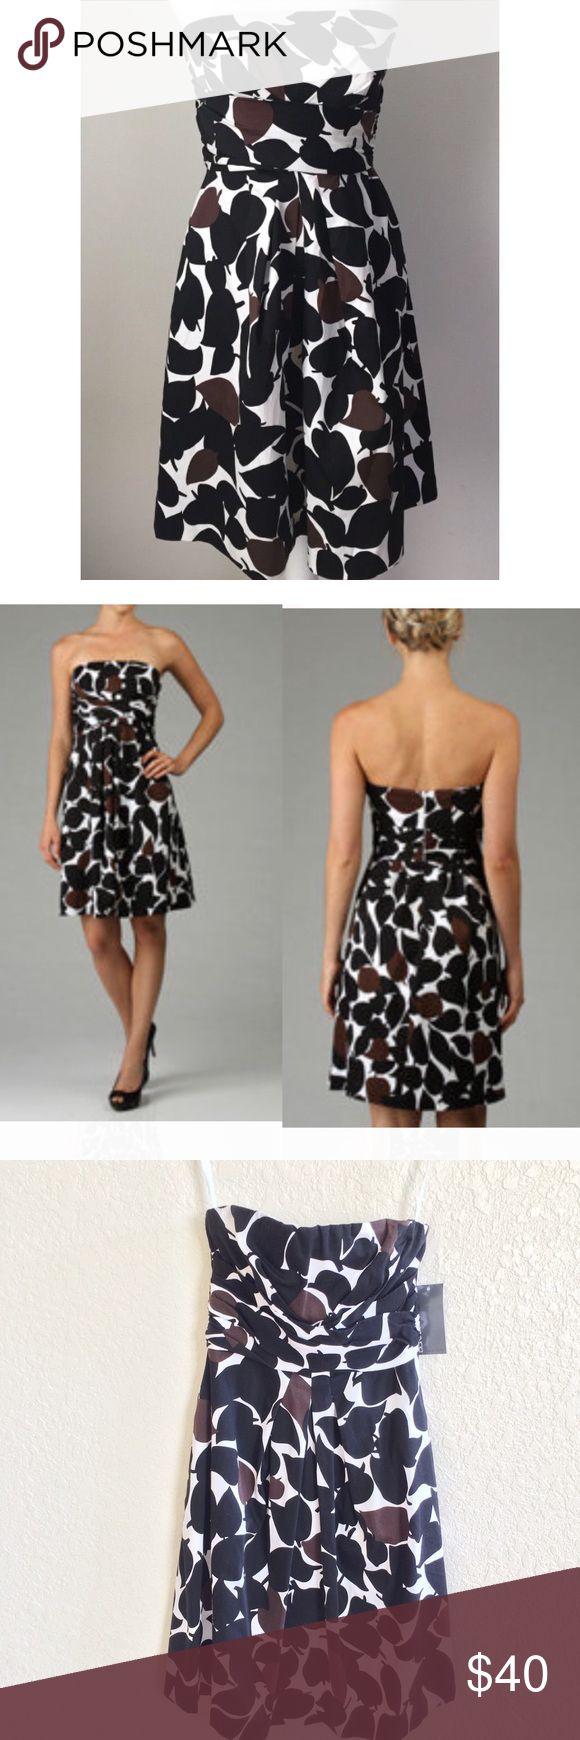 Donna Ricco Printed Dress NWT Donna Ricco Printed Dress NWT. Brown, black, & white leaf design. Has 2 side pockets. Donna Ricco Dresses Strapless